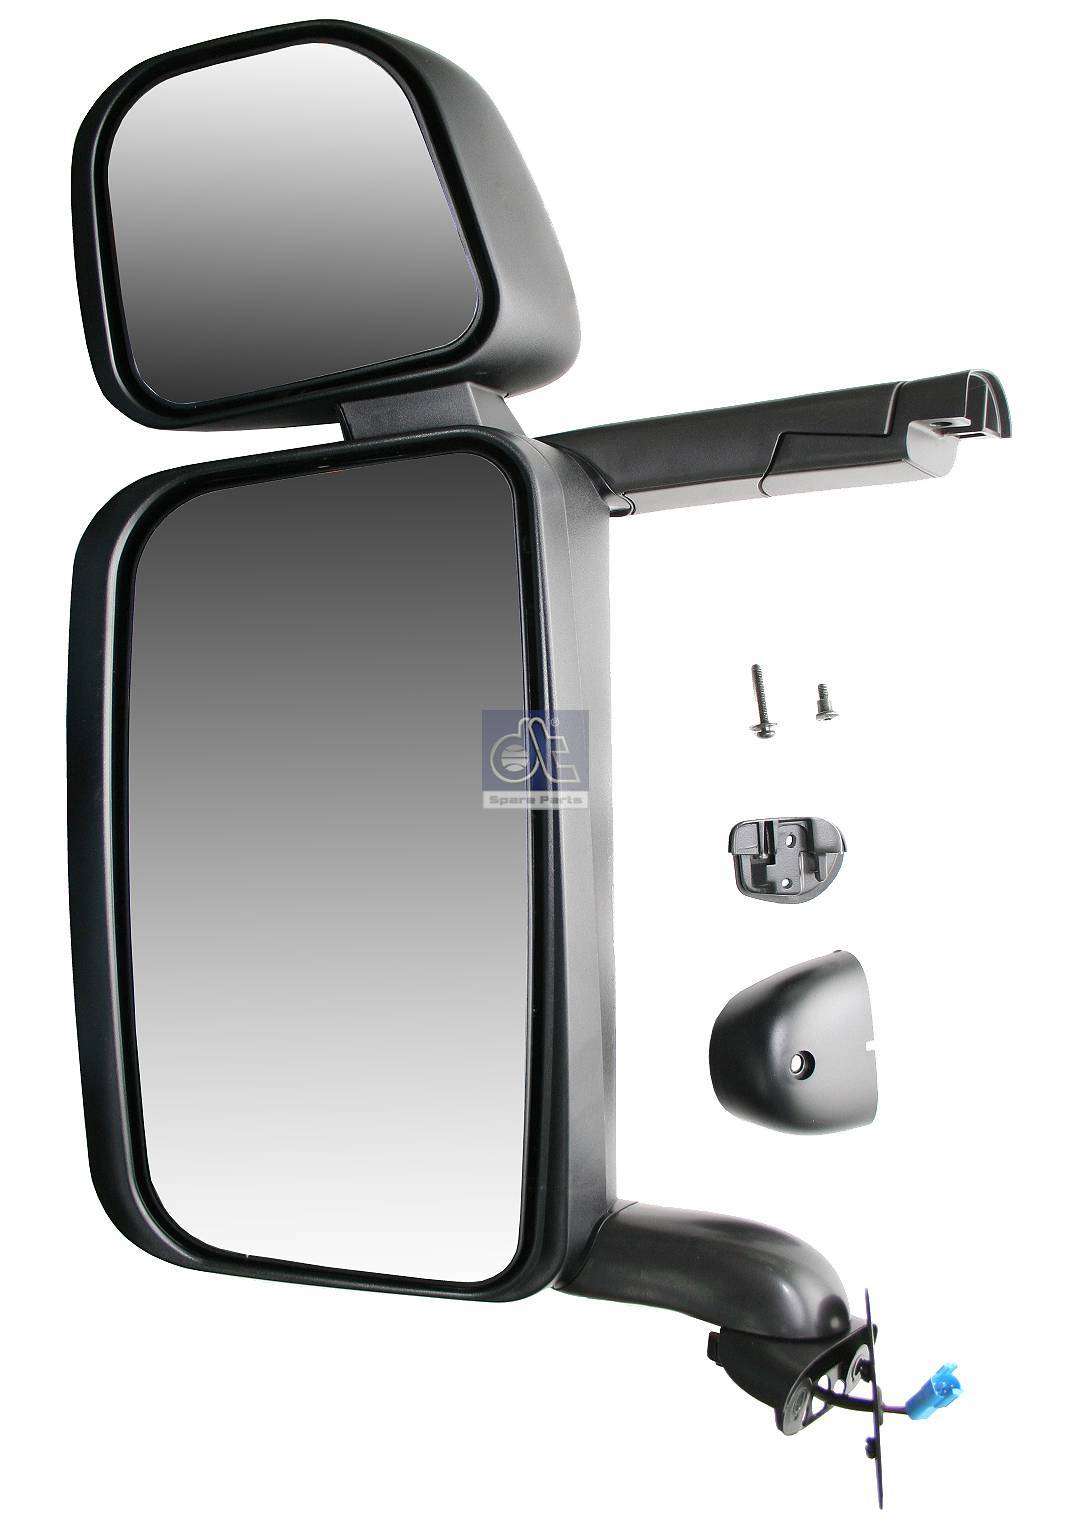 Hauptspiegel, komplett, links, beheizt, elektrisch